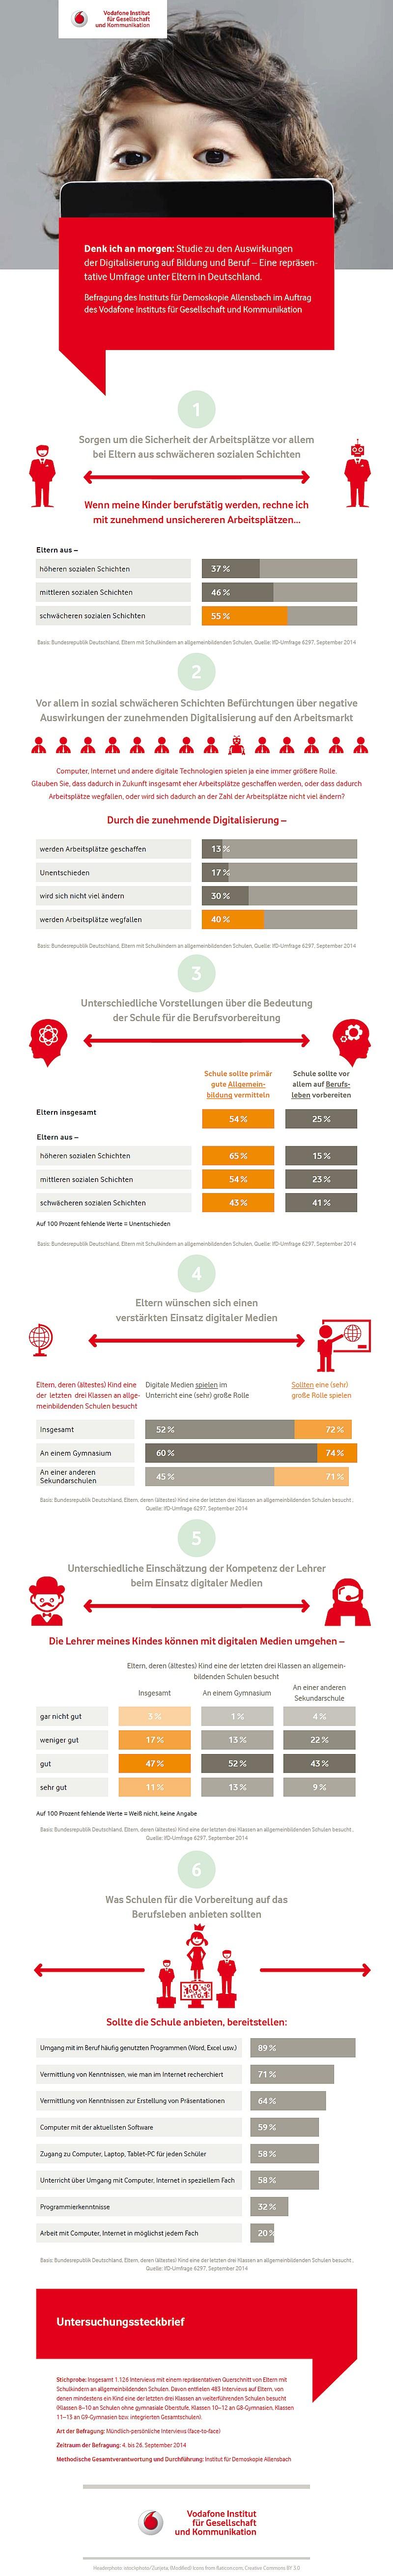 infografik allensbach vodafone institut digitale zukunft